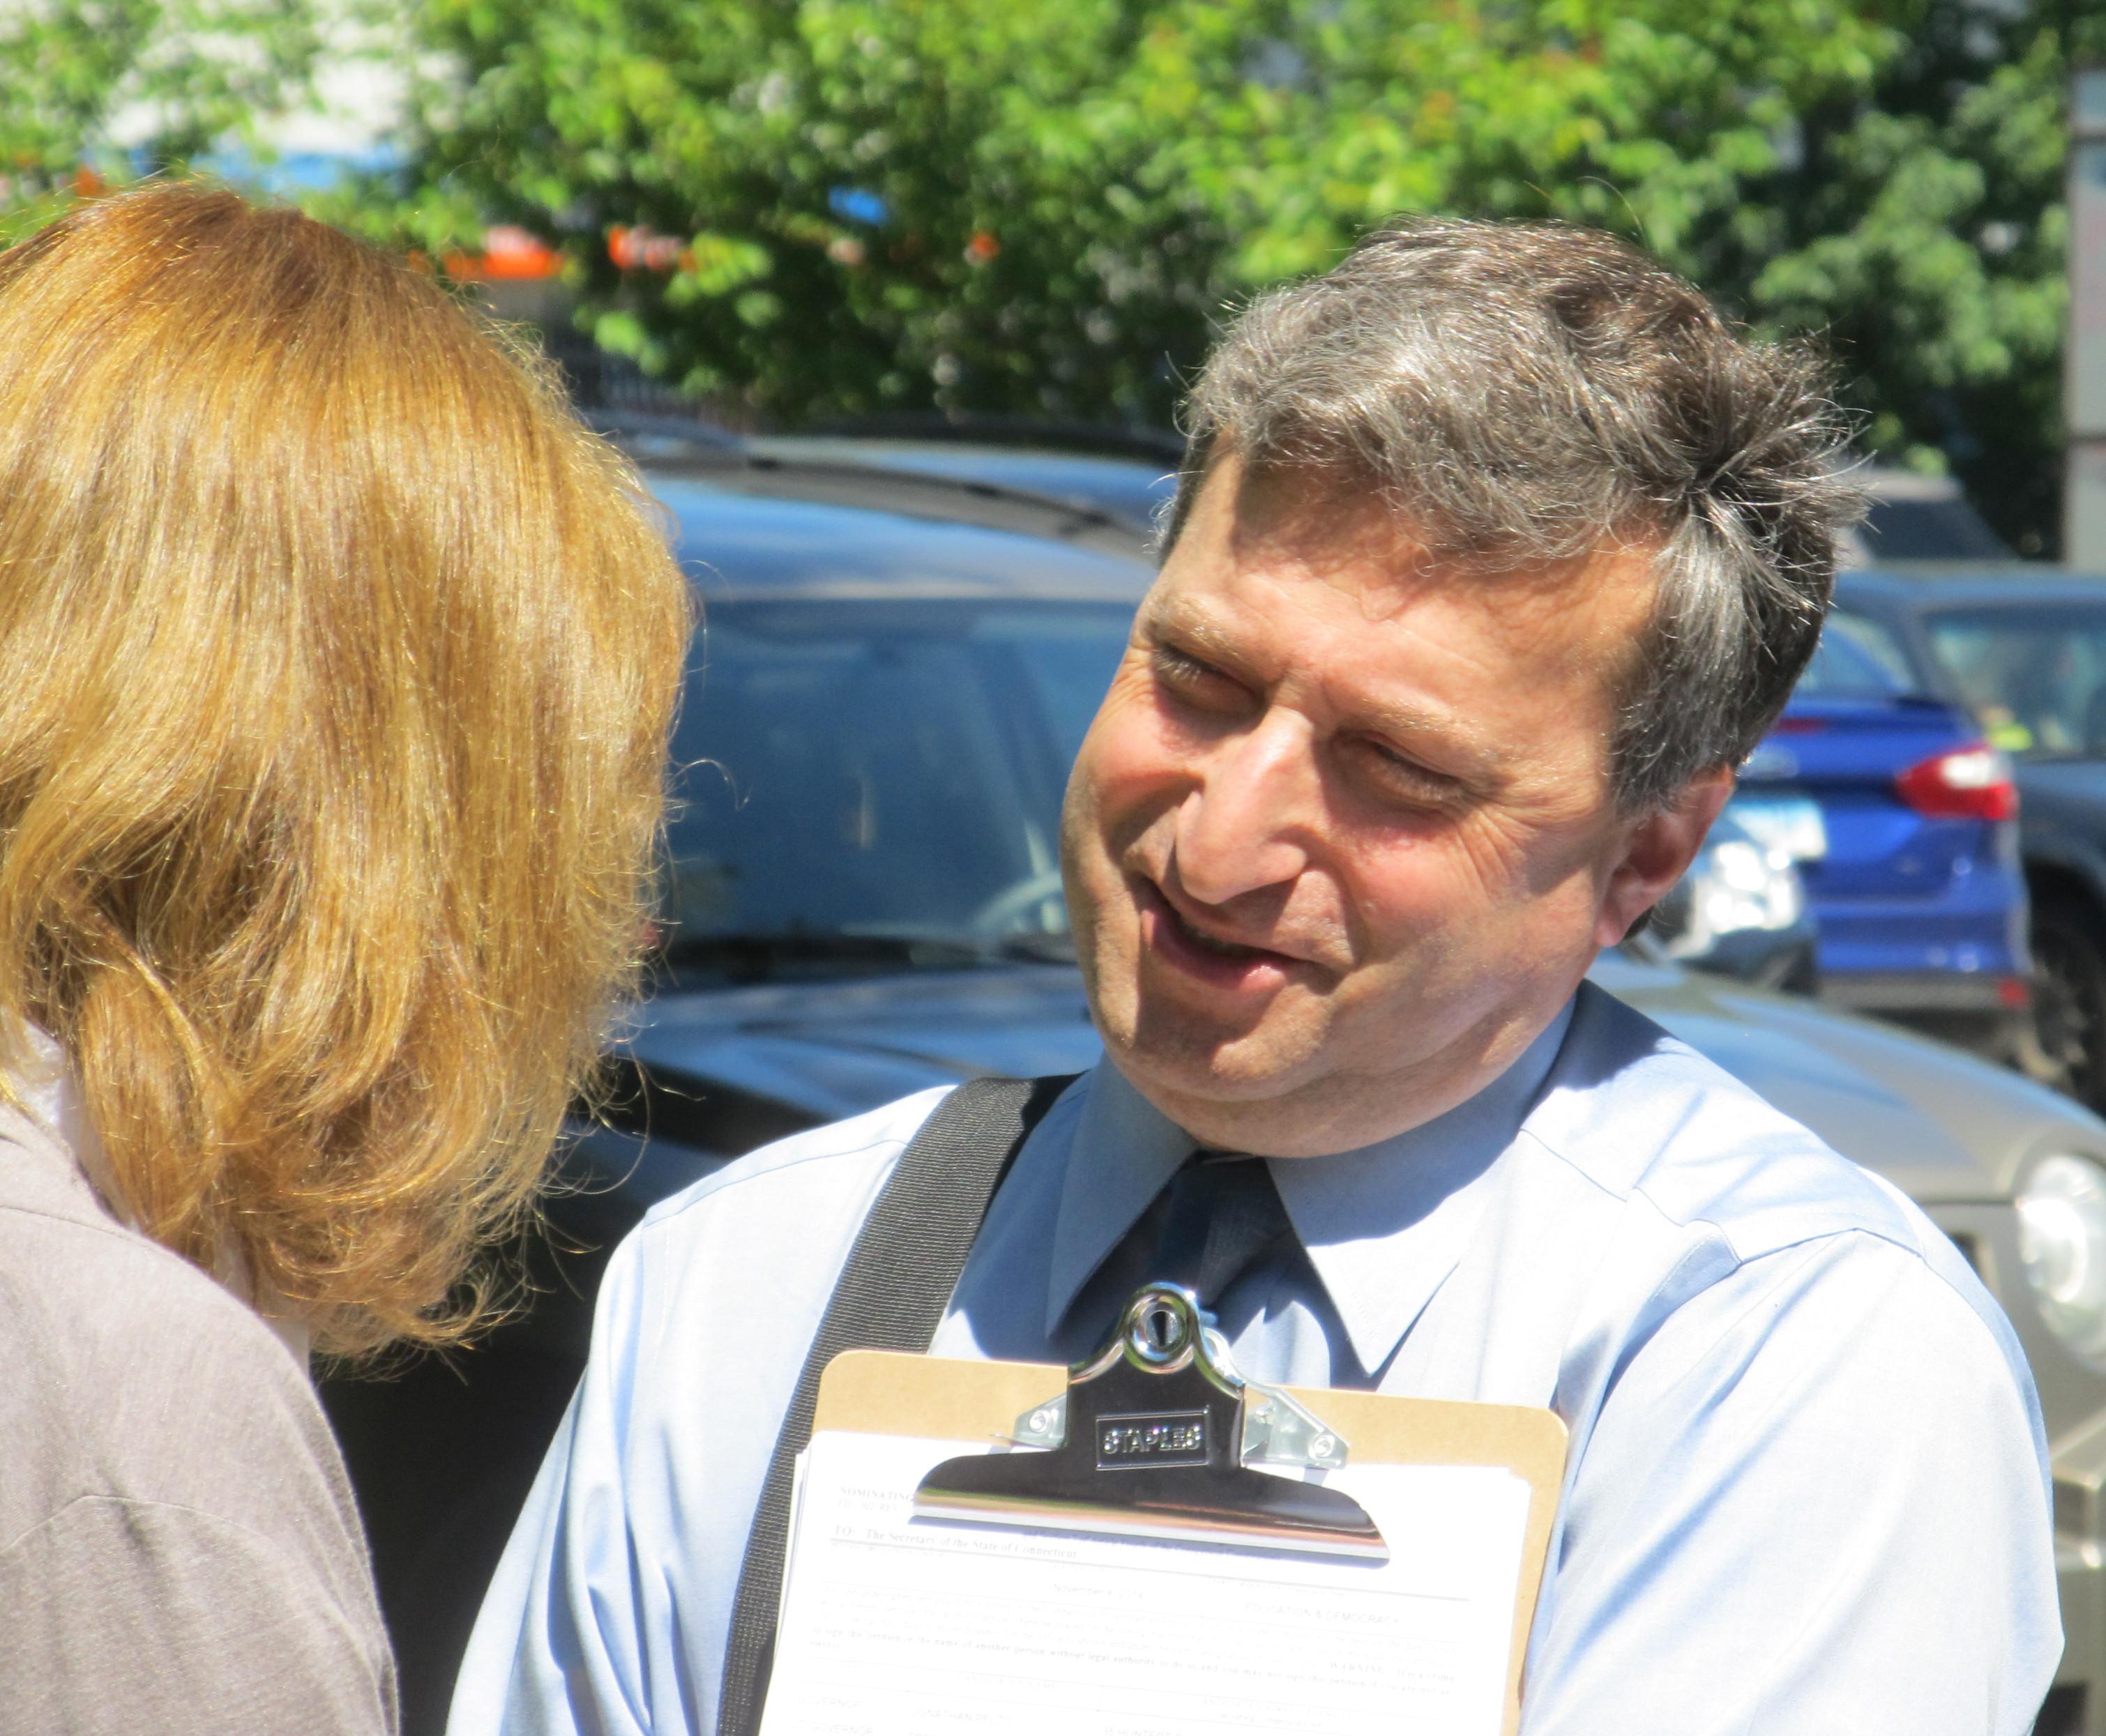 Pelto falls 3,200 signatures short of spot on CT gubernatorial ballot